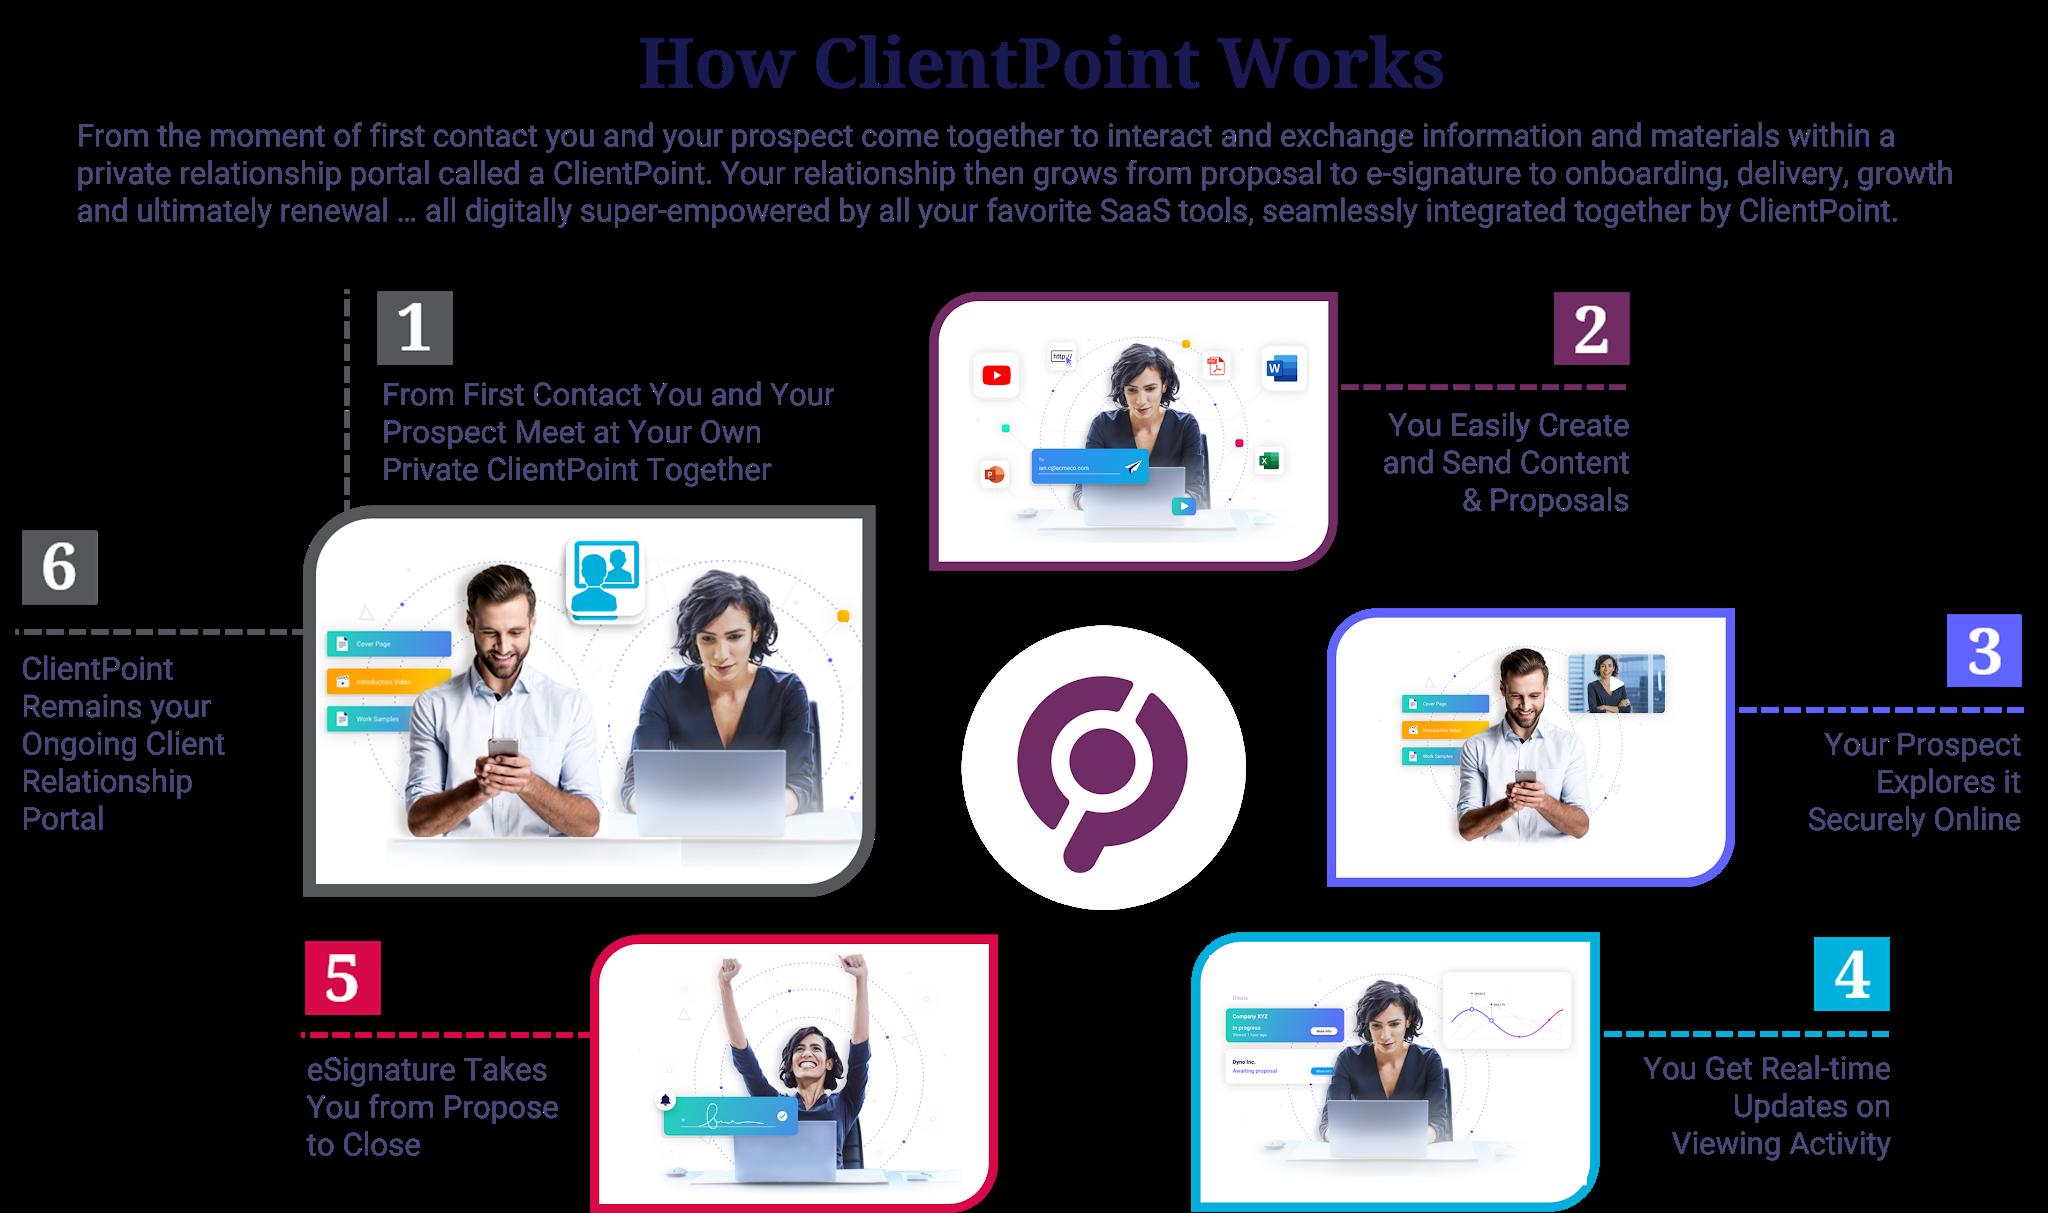 How ClientPoint Works 6 Step Method TRANSPARENT for a LIGHT BG